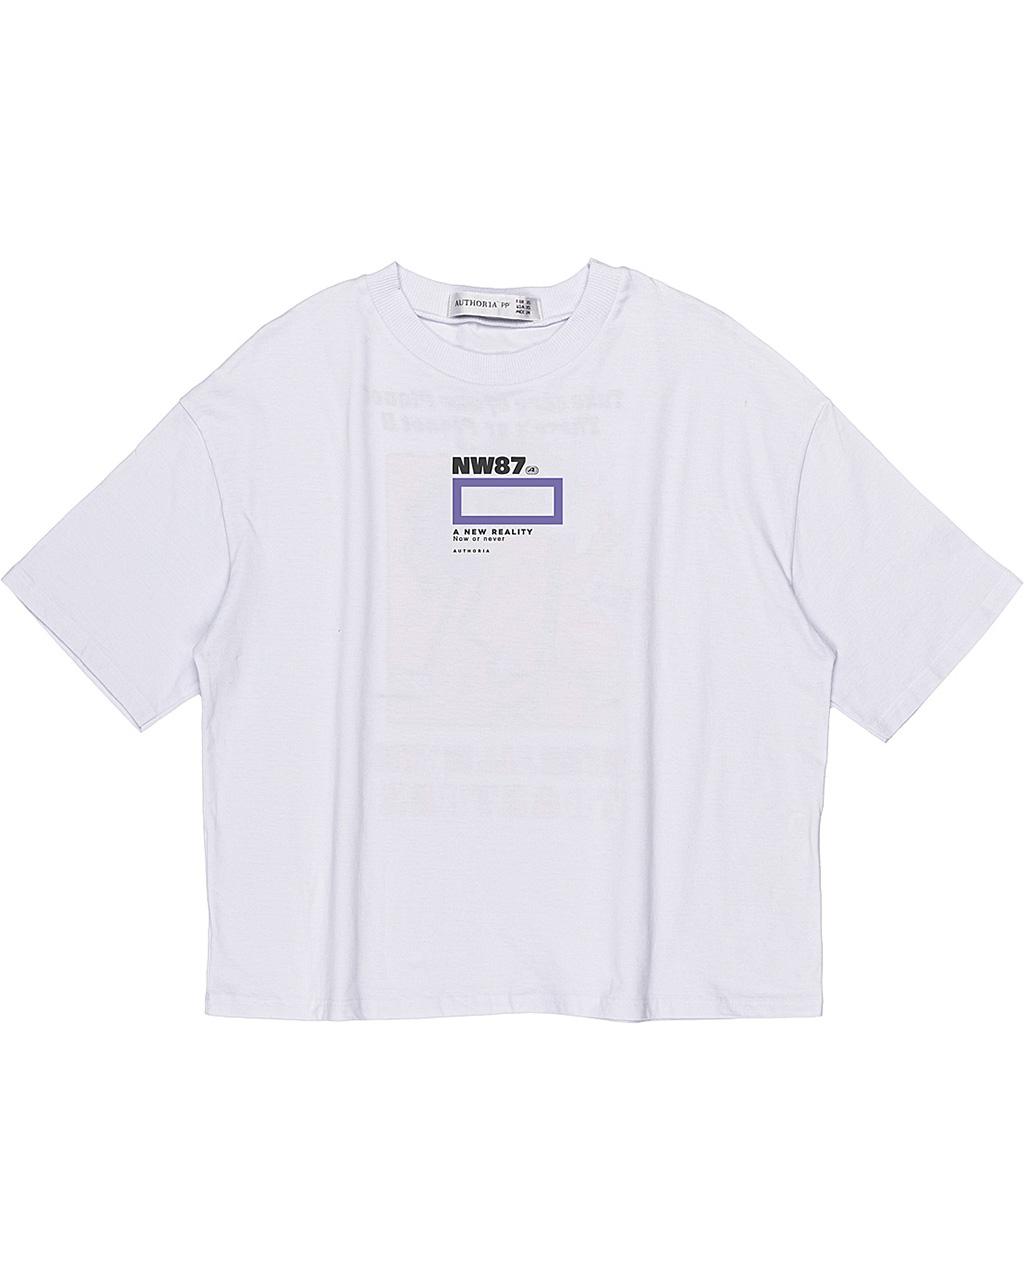 T-Shirt Teen Off White Authoria